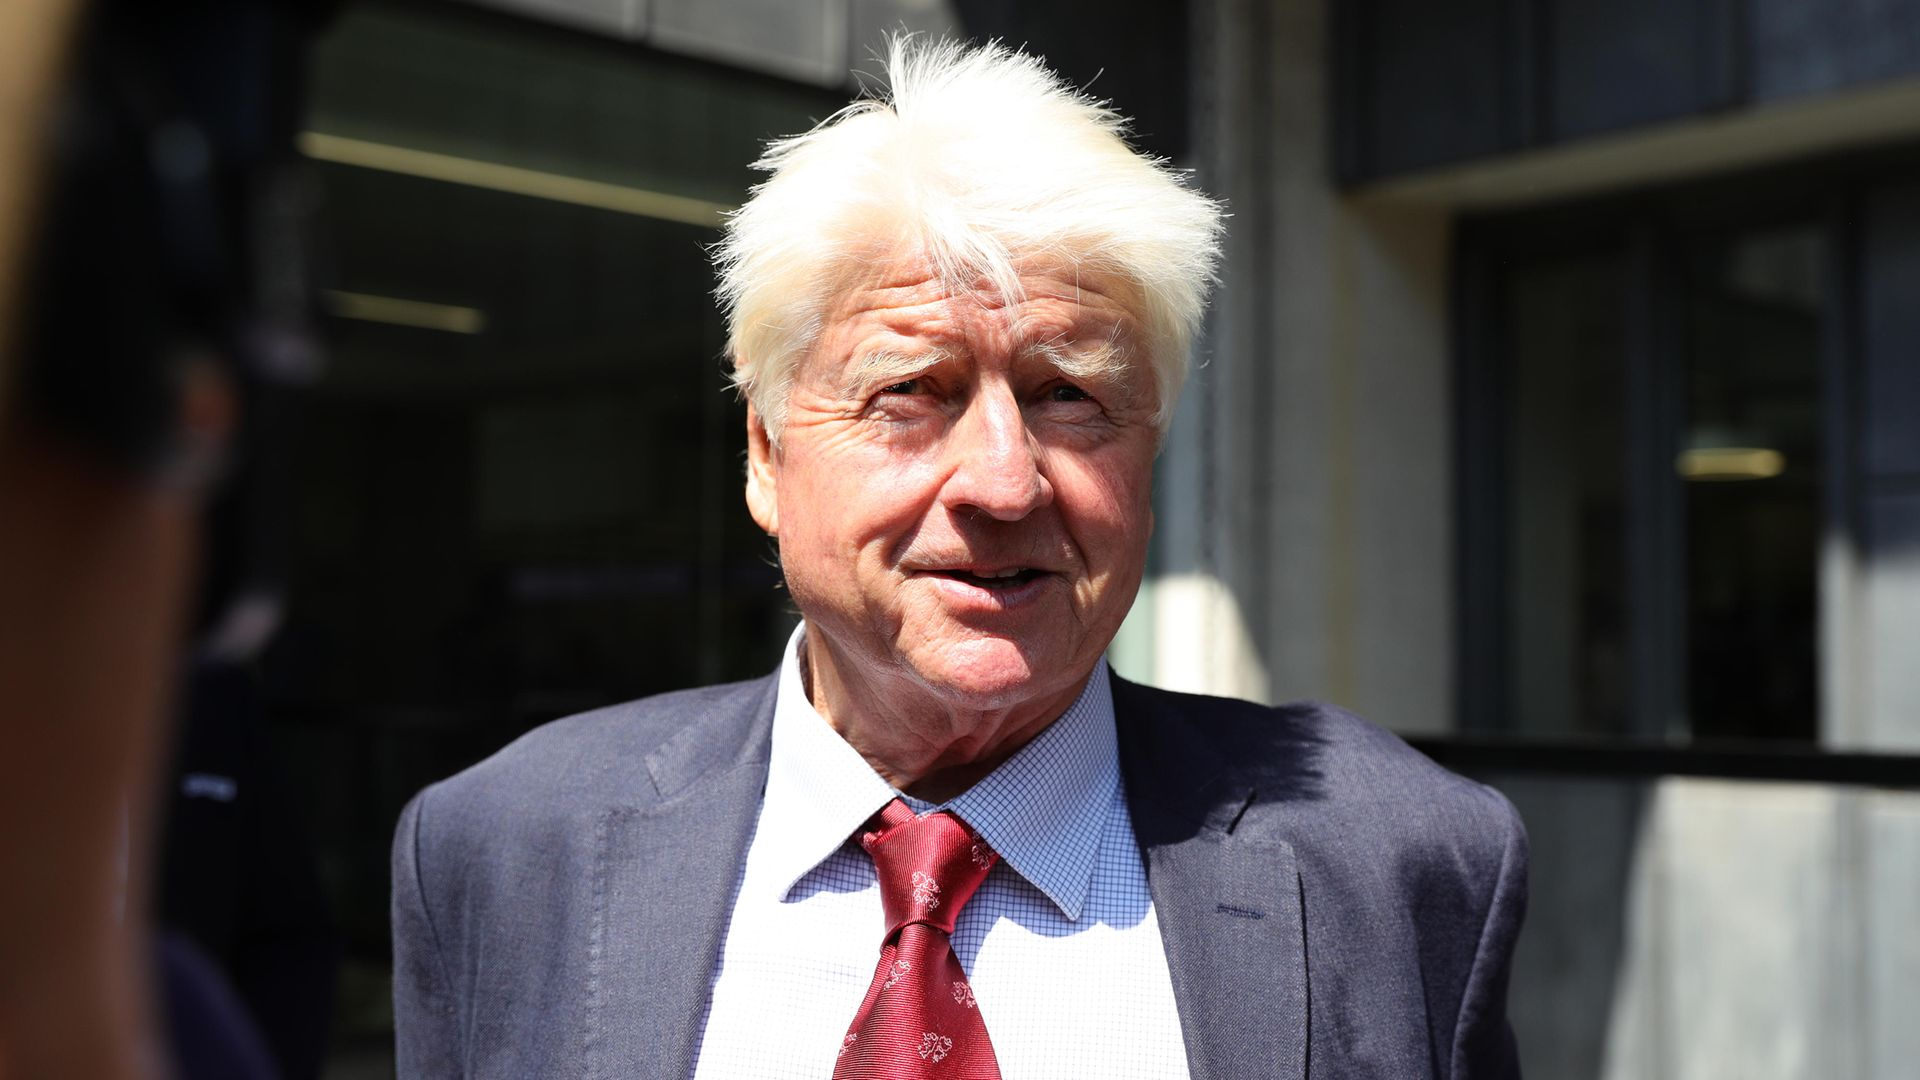 Stanley Johnson leaving the Queen Elizabeth II Centre in London - Credit: PA